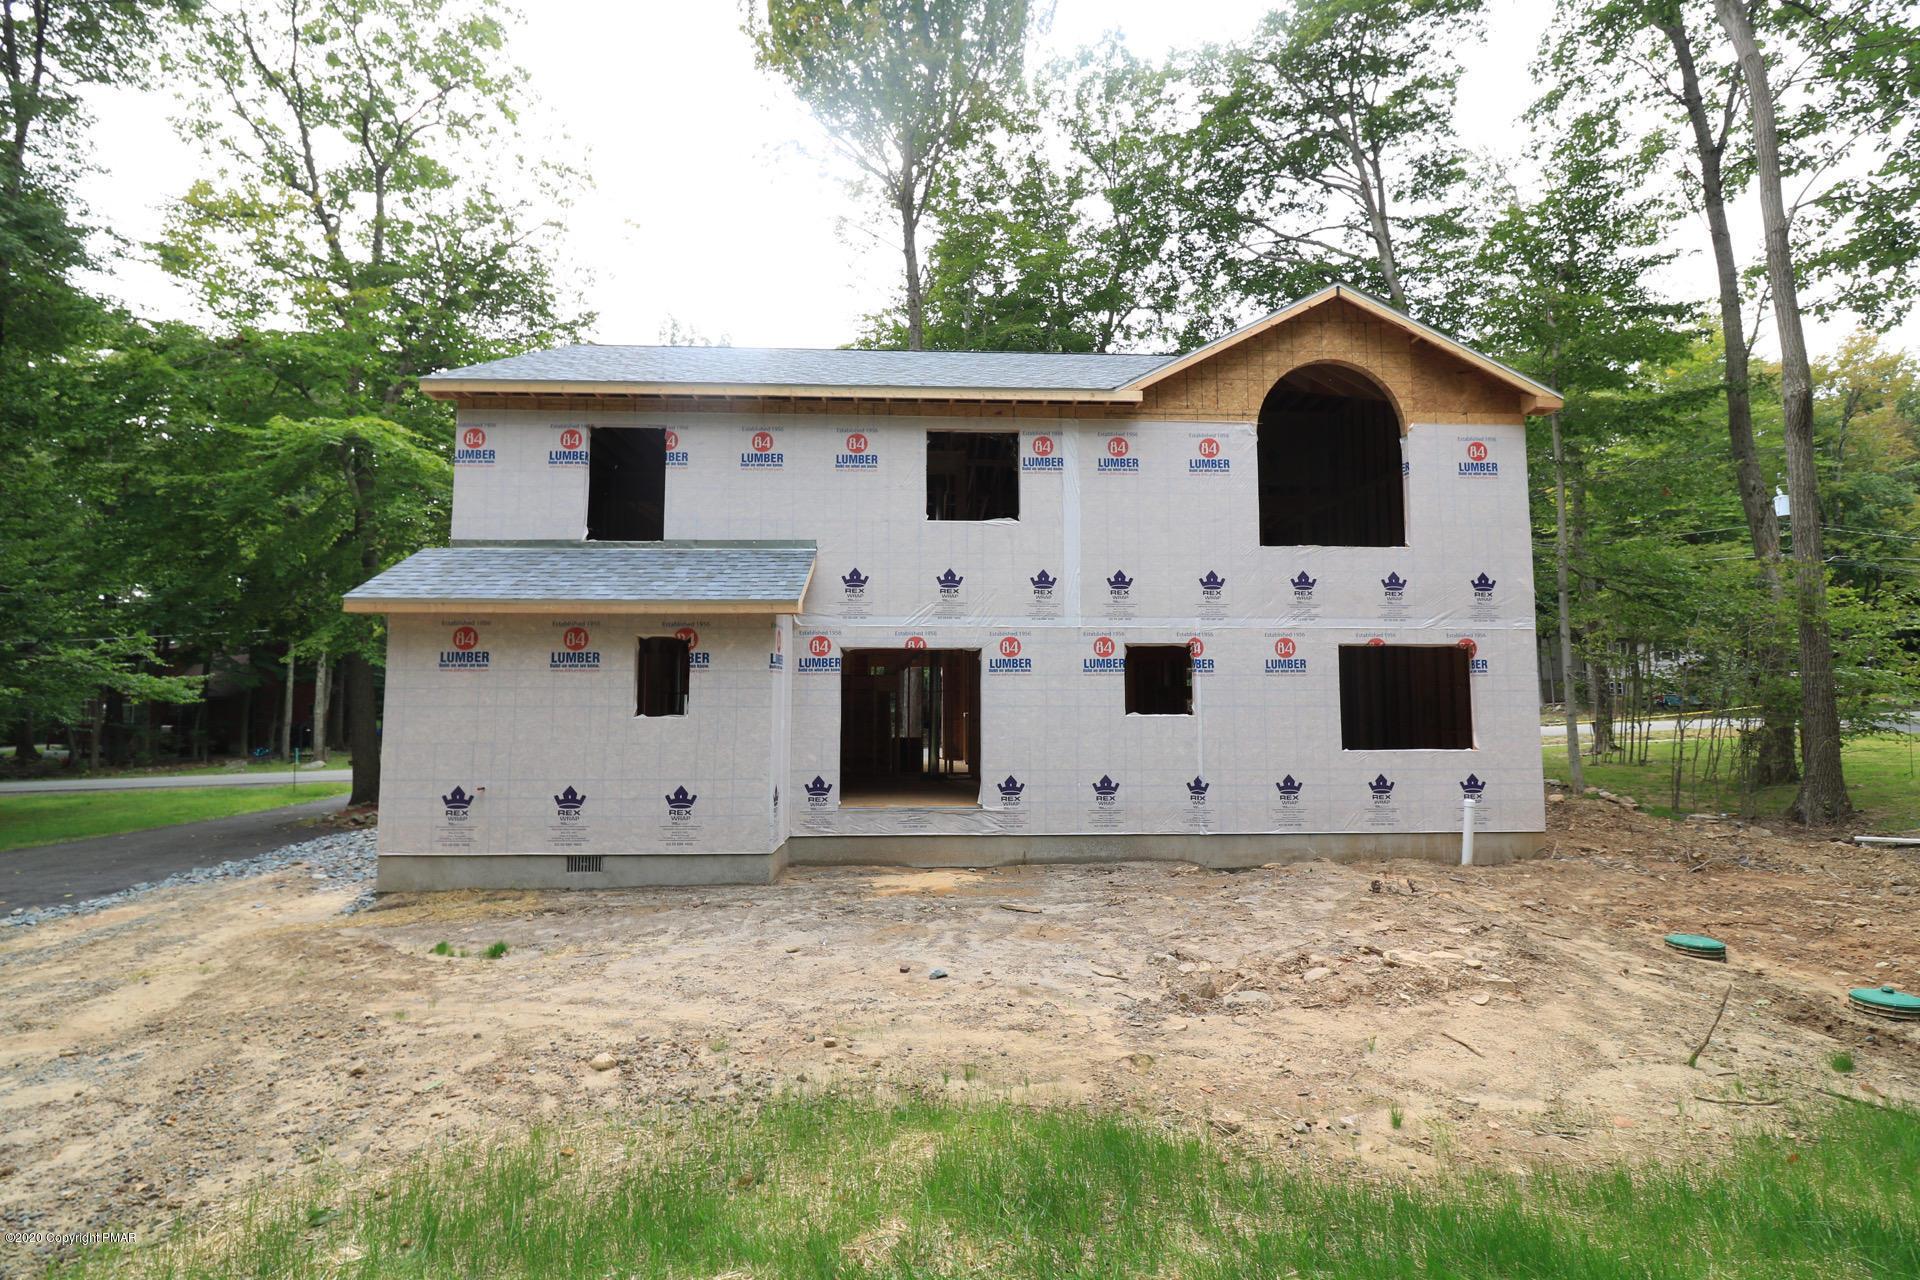 3340 Oberon Rd, Tobyhanna, PA 18466